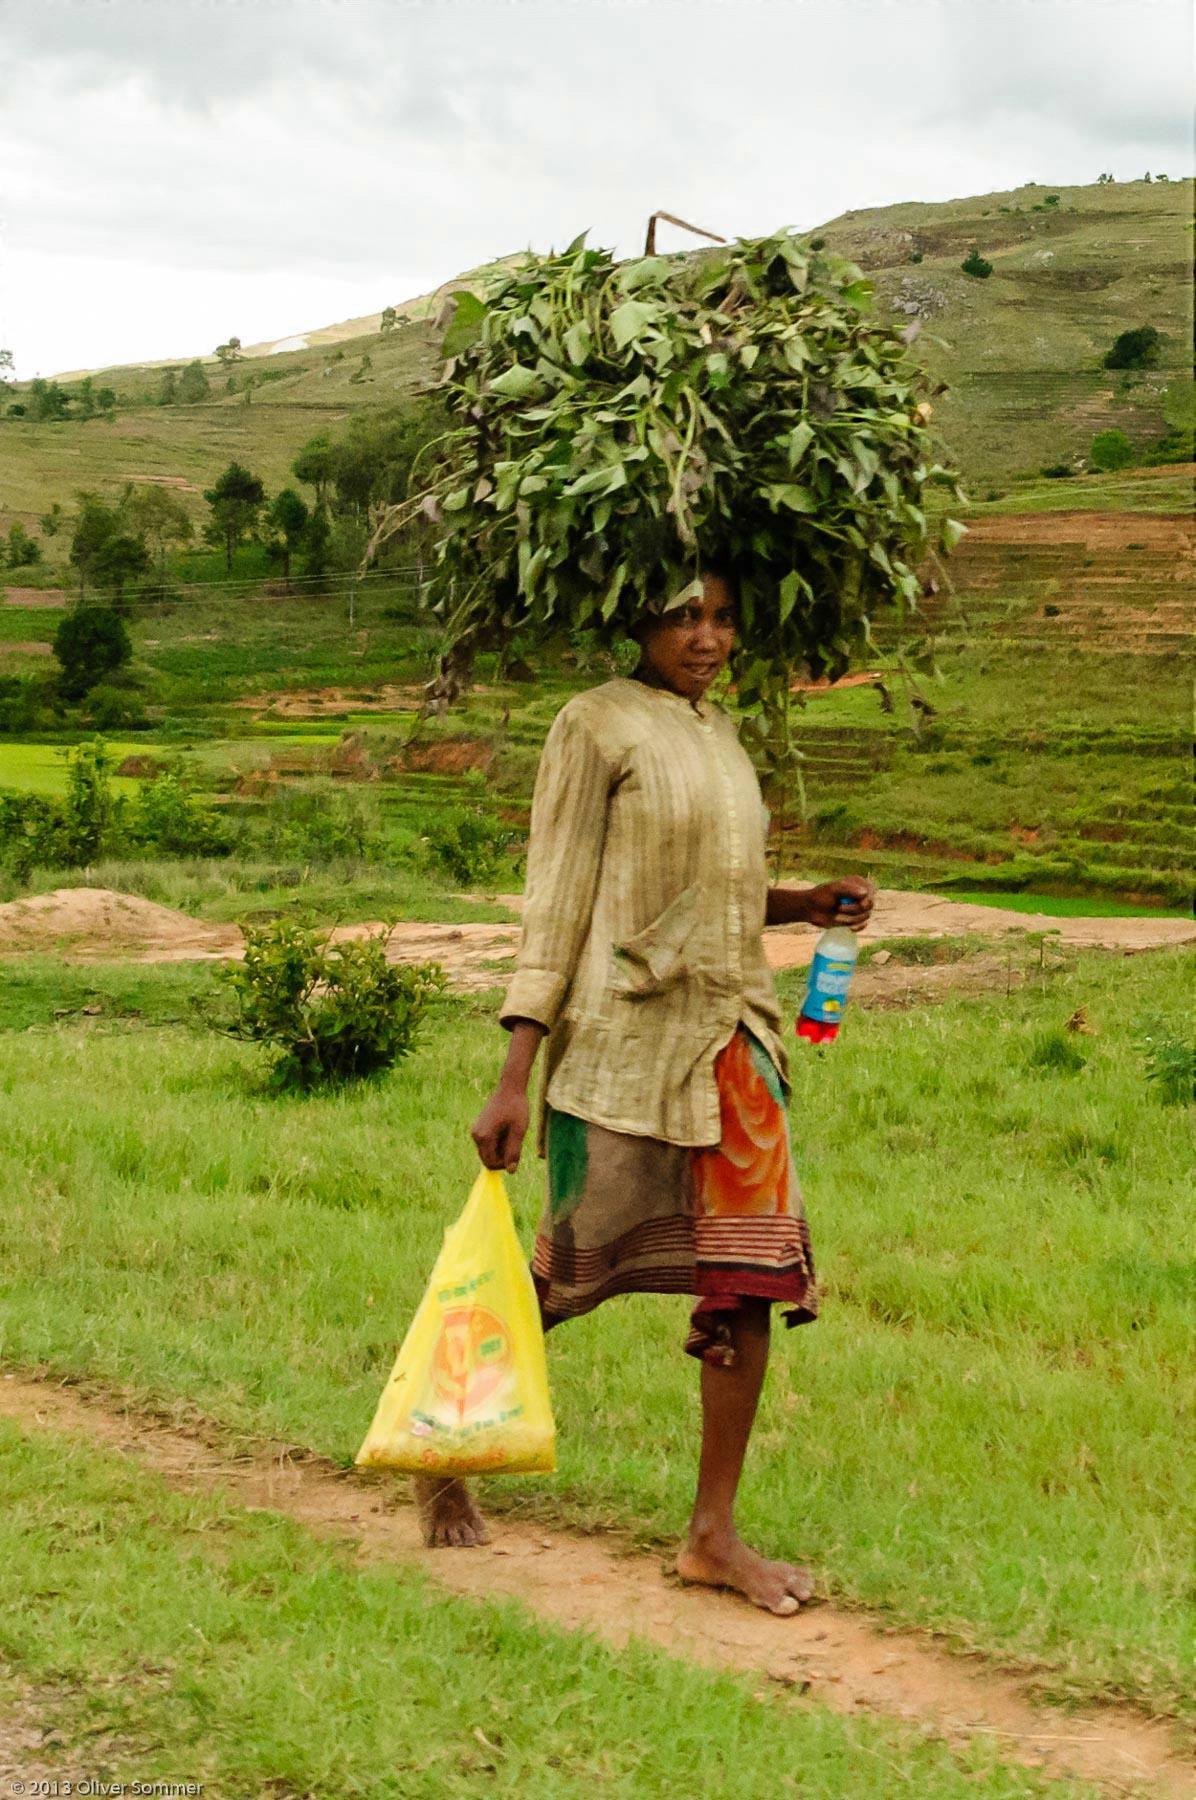 Carrying, Female, Food, Head, People, Person, Plant, Portrait, Woman, Women, human